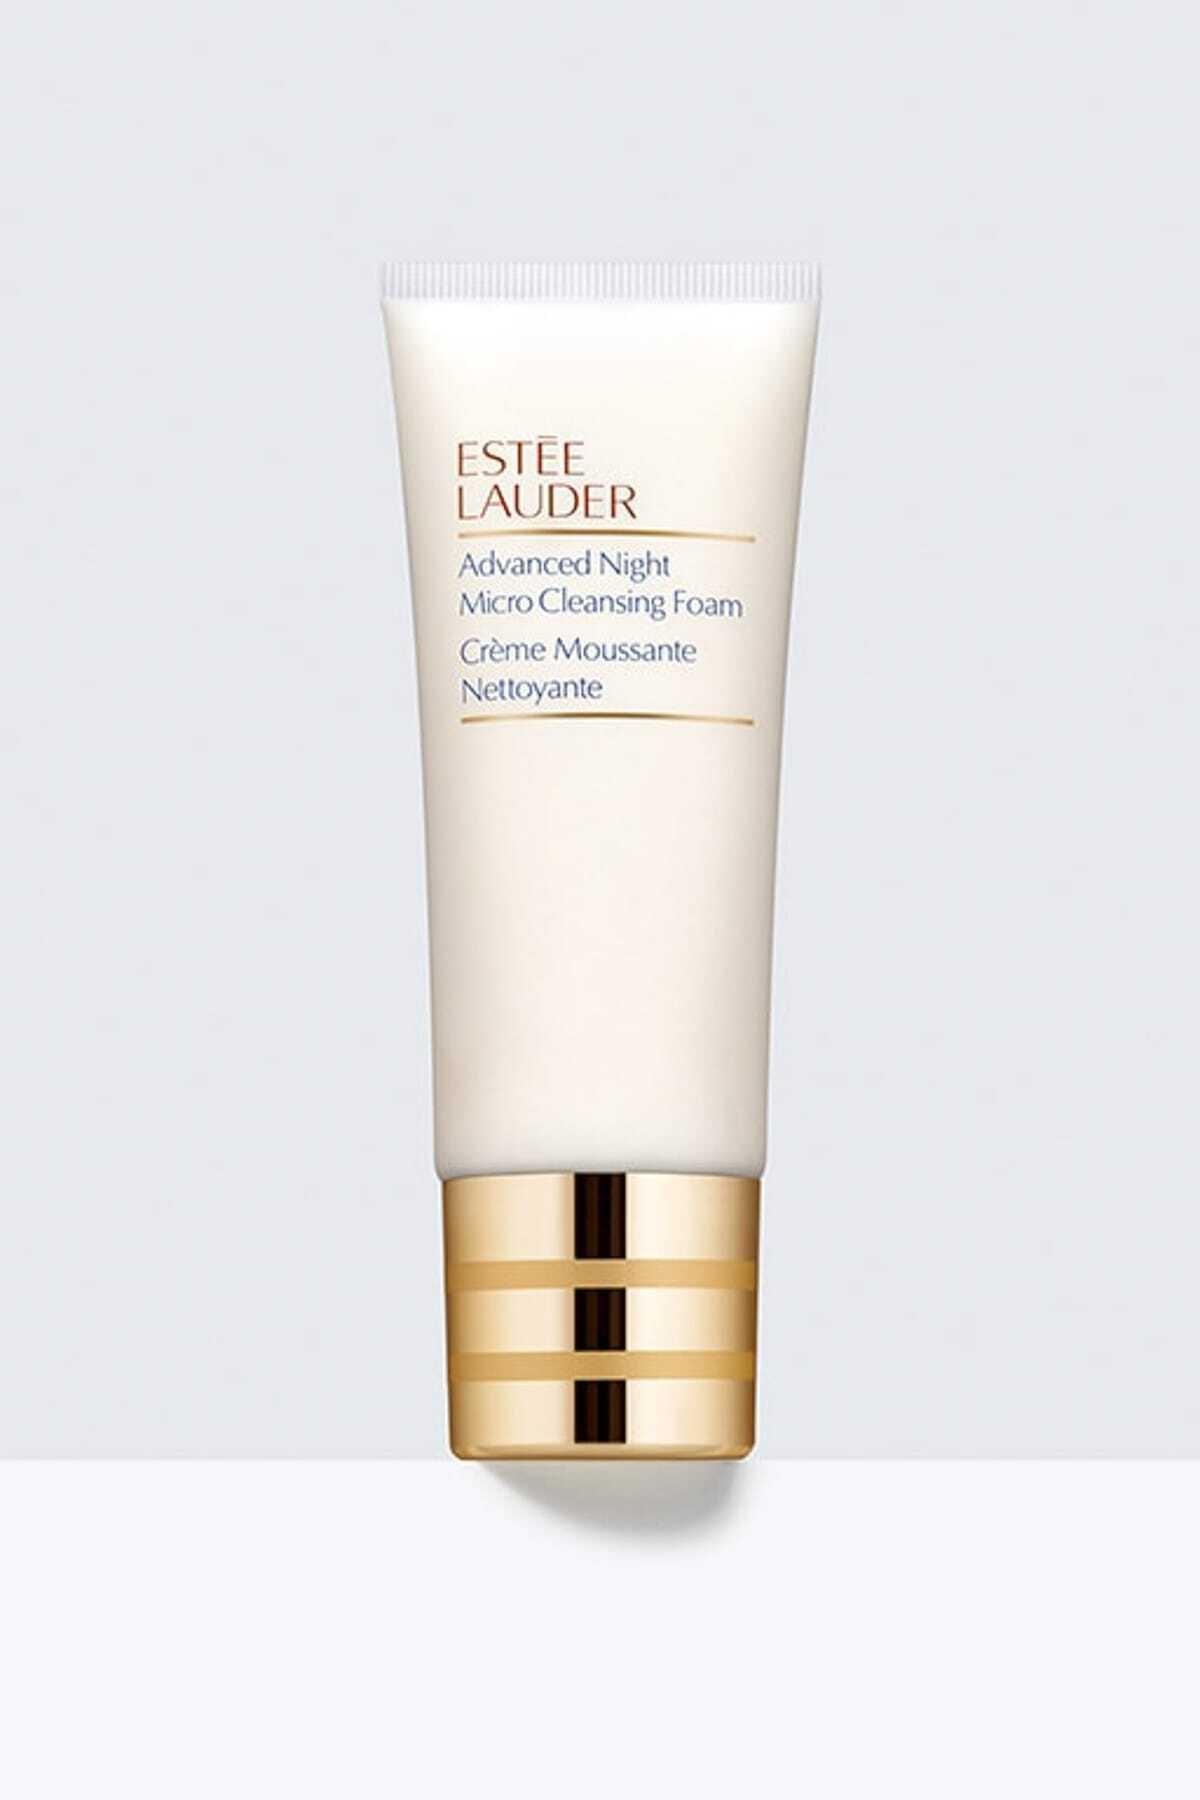 Estee Lauder Makyaj Temizleme Köpüğü - Advanced Night Repair Micro Cleansing Foam 100 ml 887167223769 1